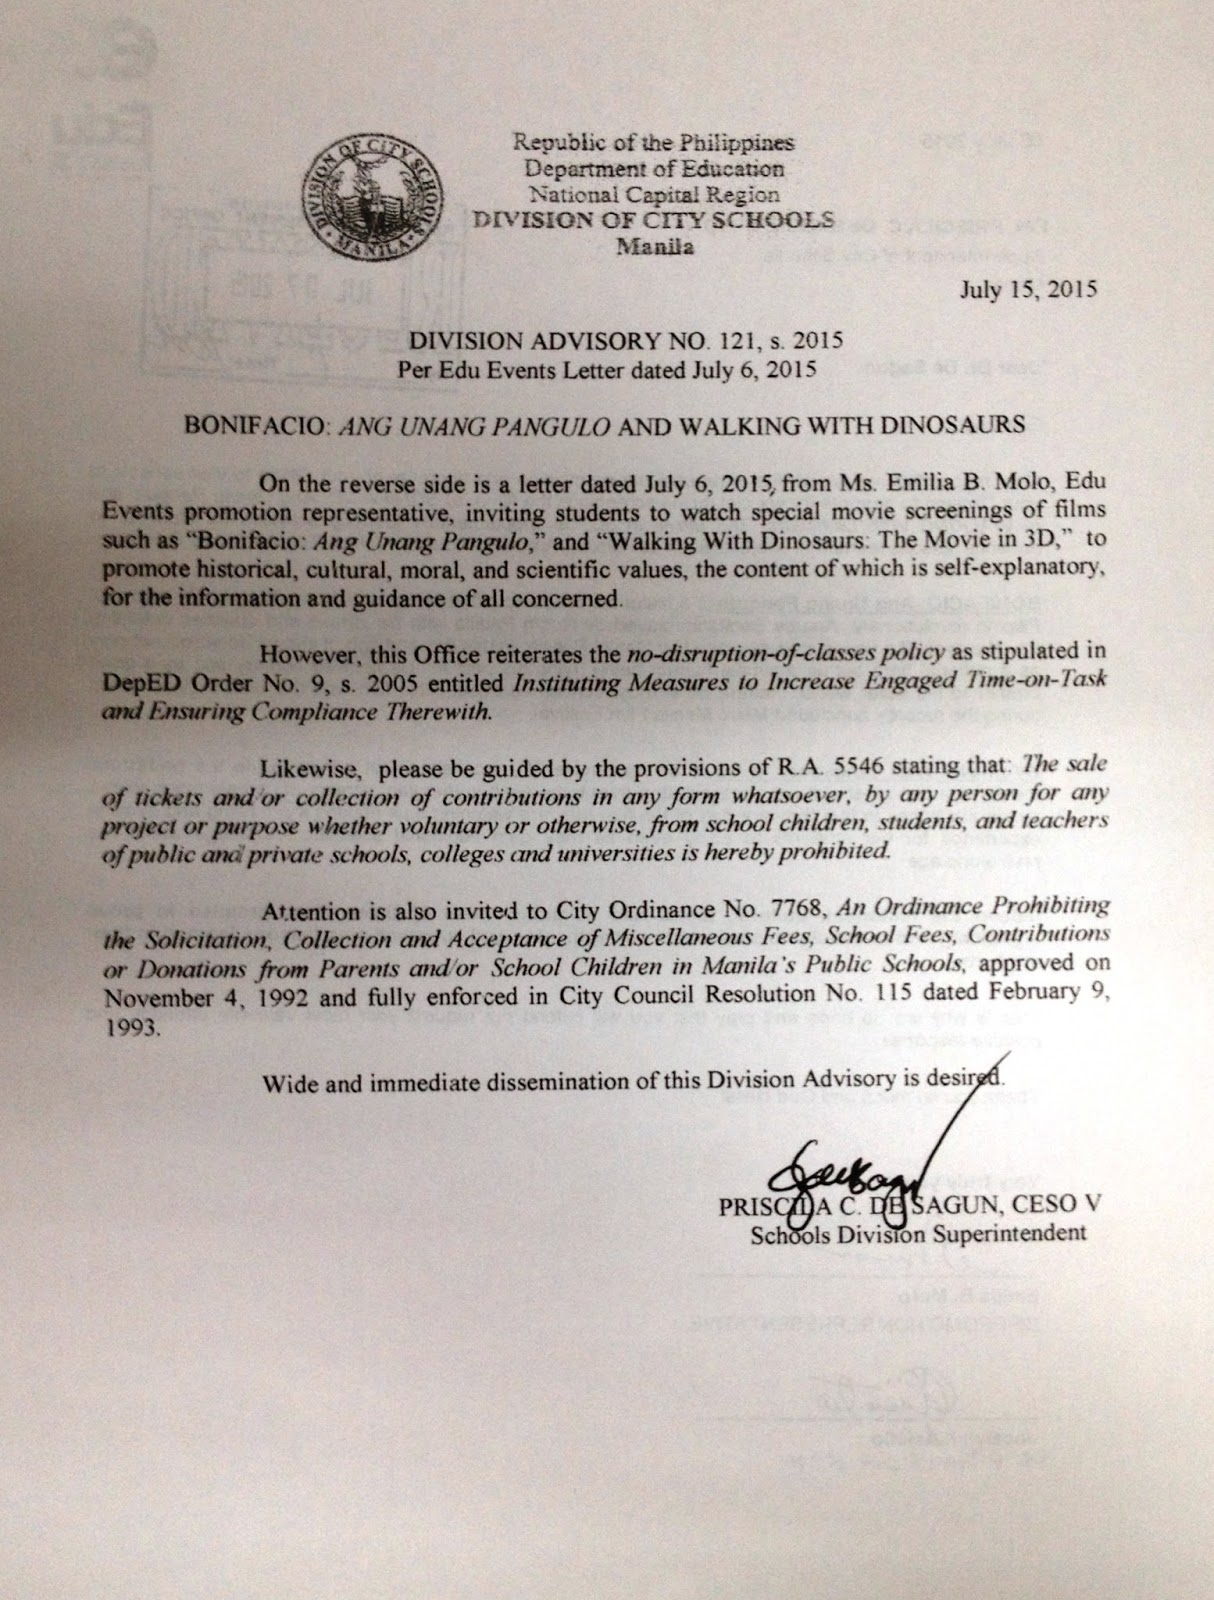 Division Advisory No 121 S 2015